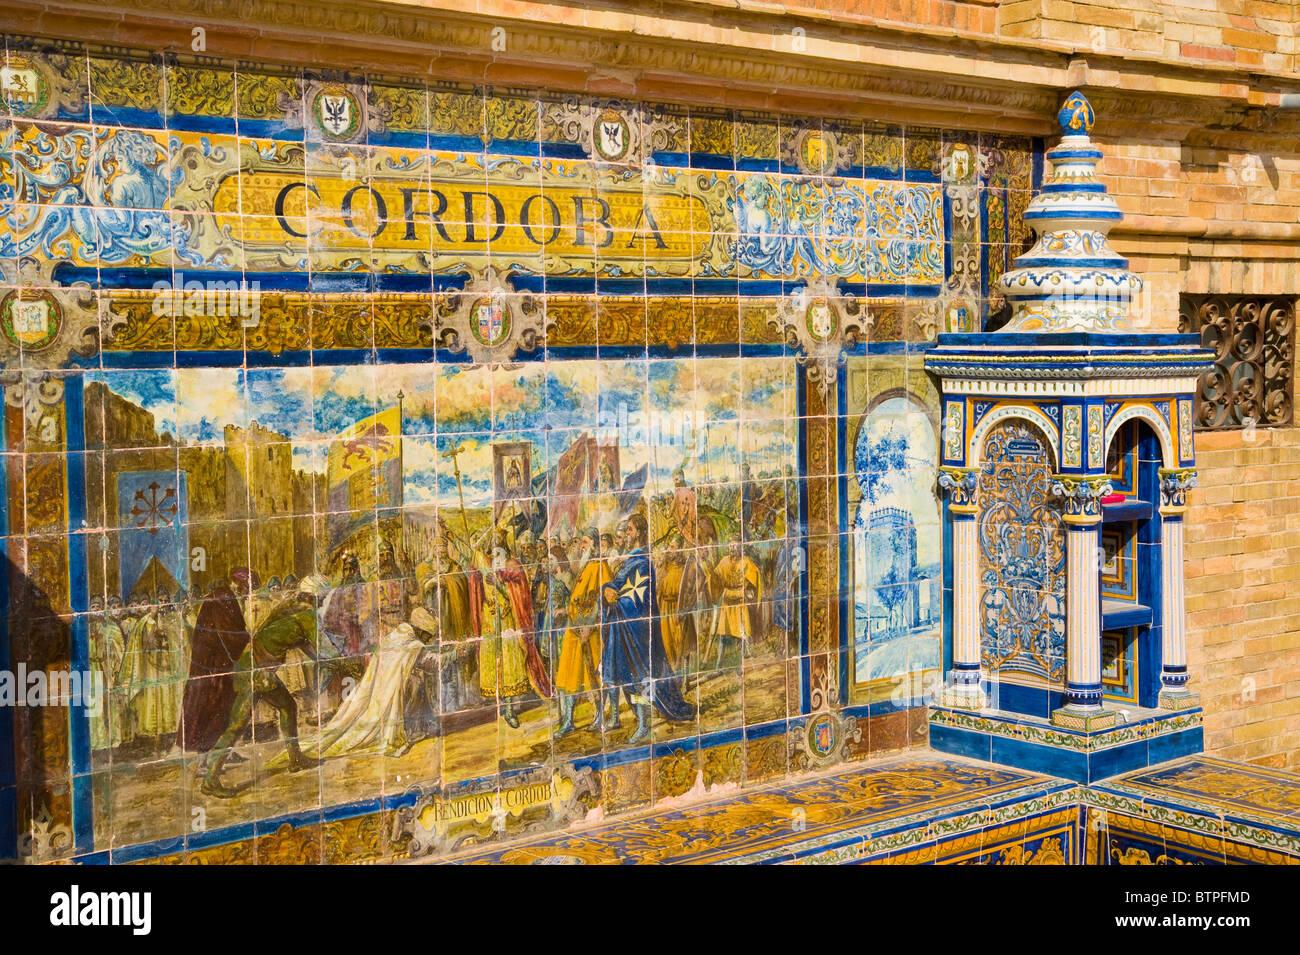 Decorative Tiles, Plaza de Espana, Seville, Andulucia, Spain - Stock Image